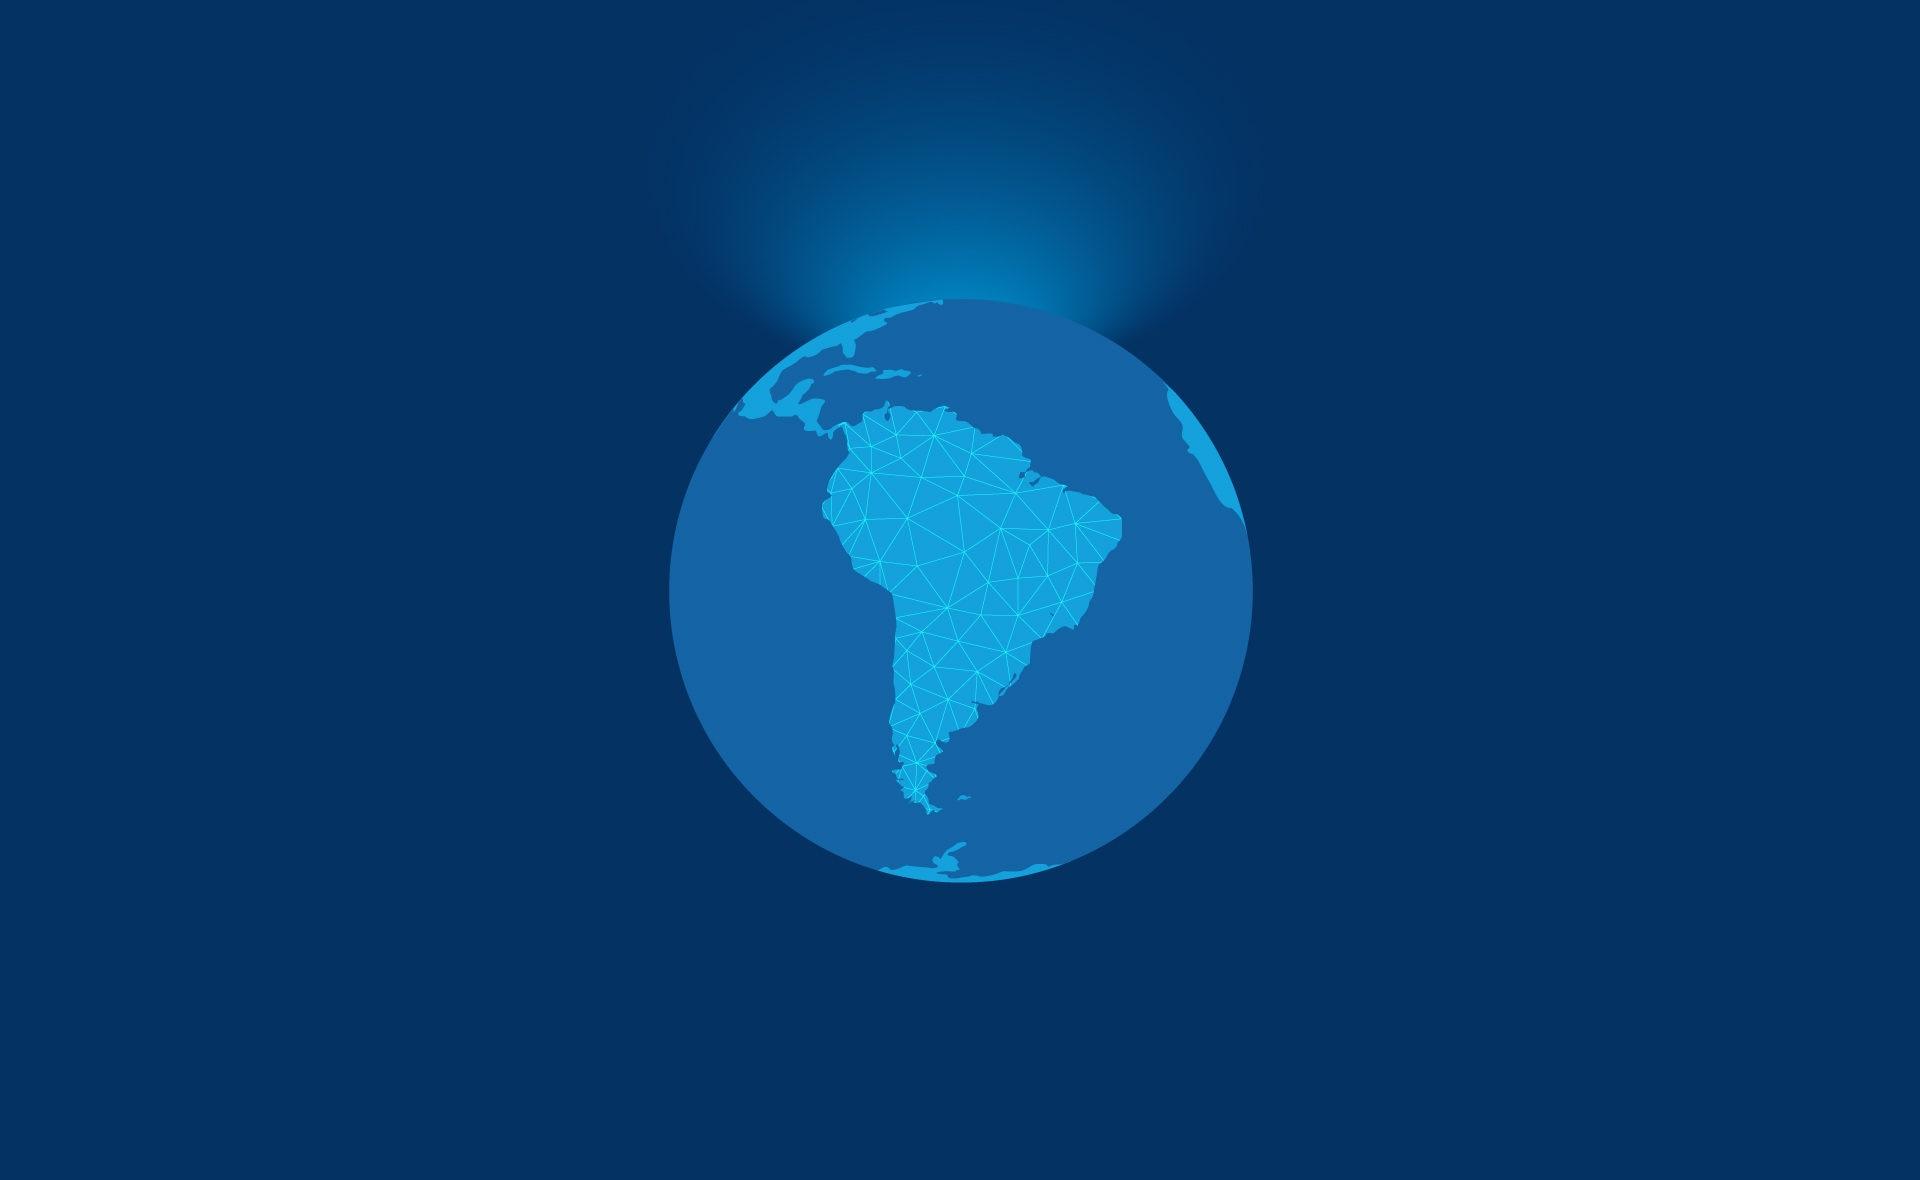 latam-ilustración-latinoamerica-mundo-tierra